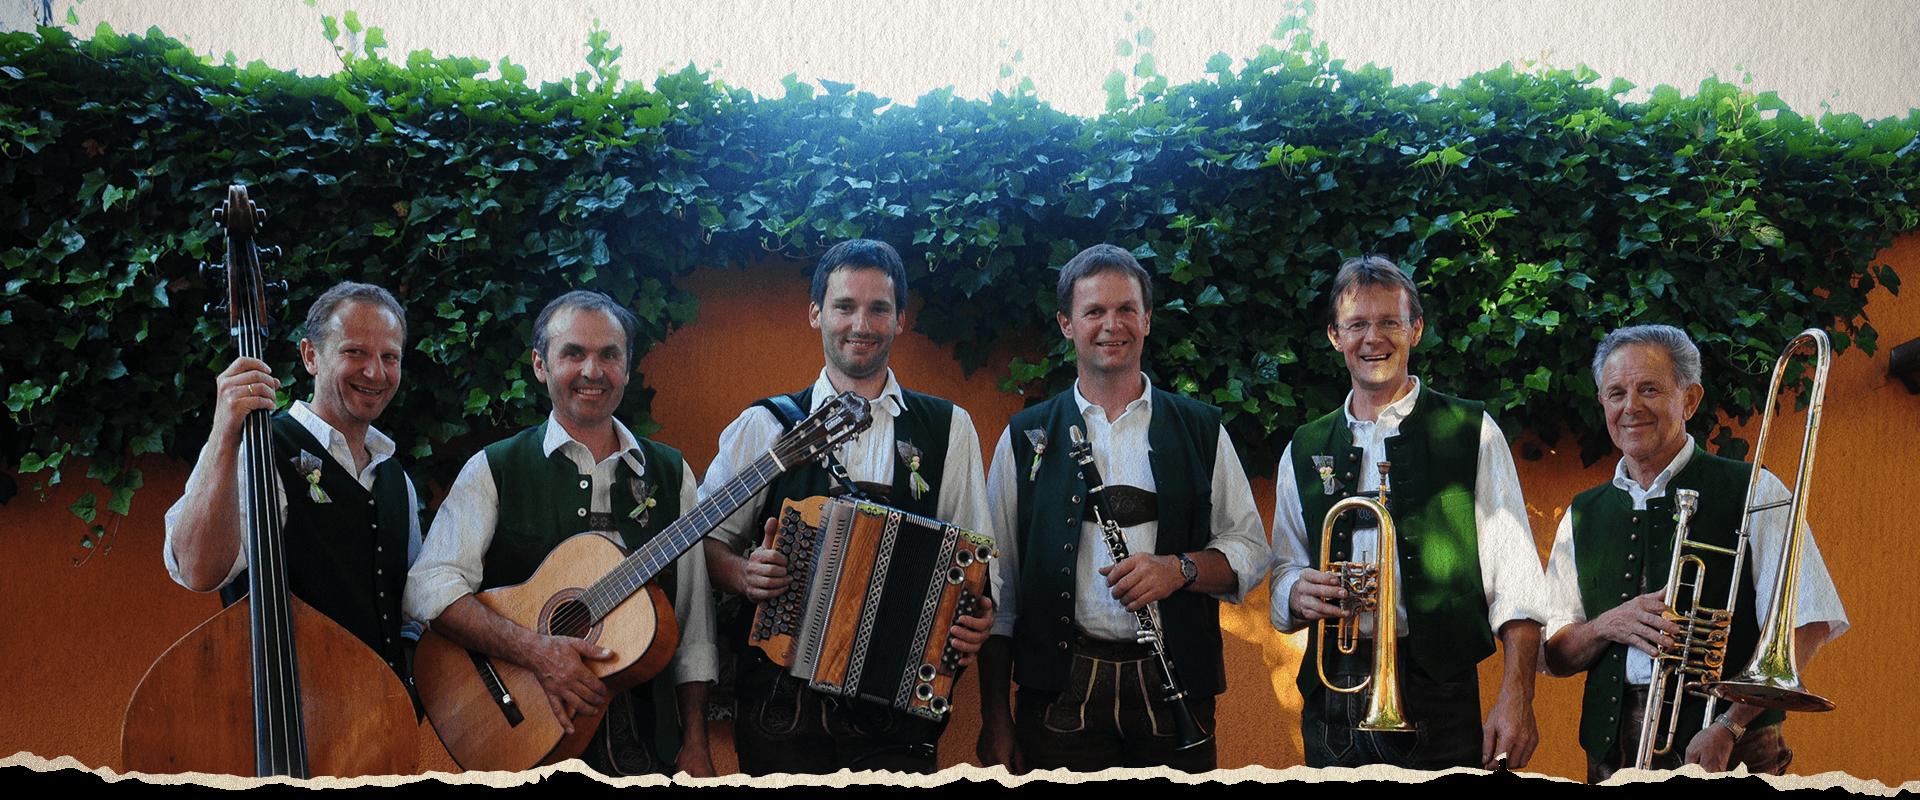 Weißenbacher Tanzlmusi